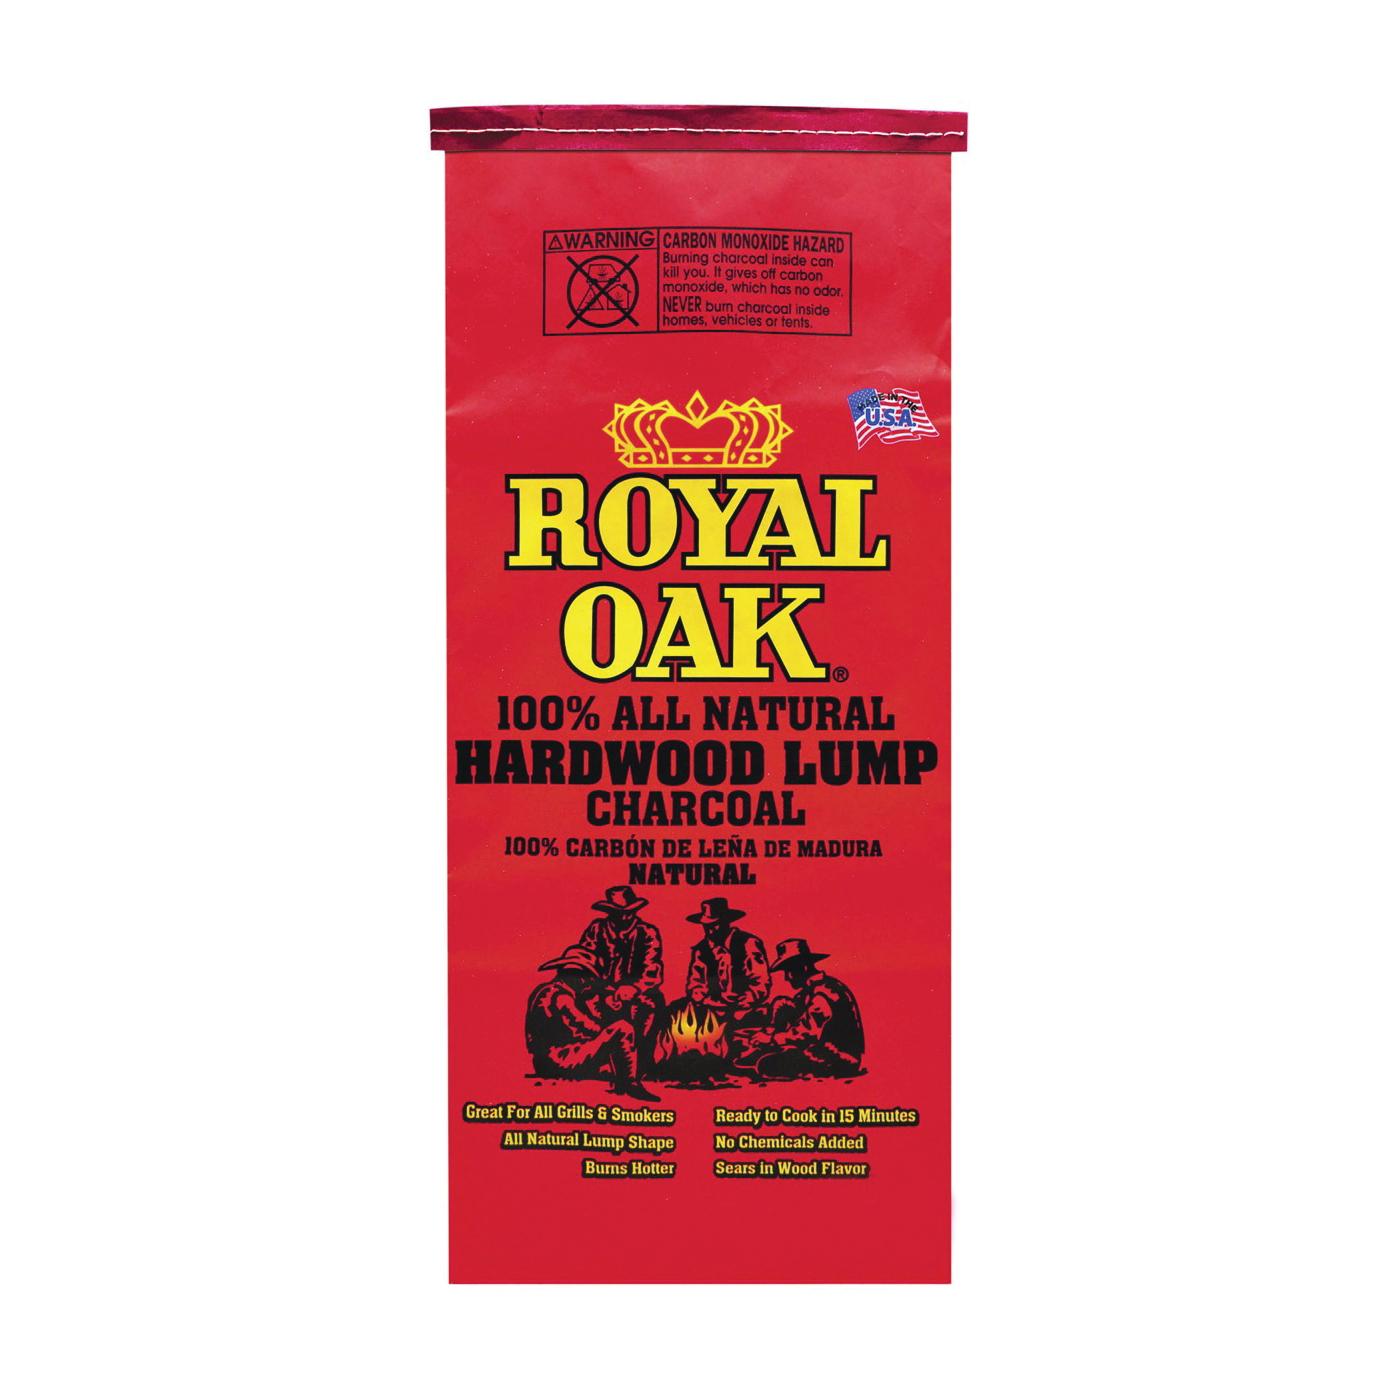 Picture of ROYAL OAK 195-228-123 Lump Charcoal, 8.8 lb Package, Bag